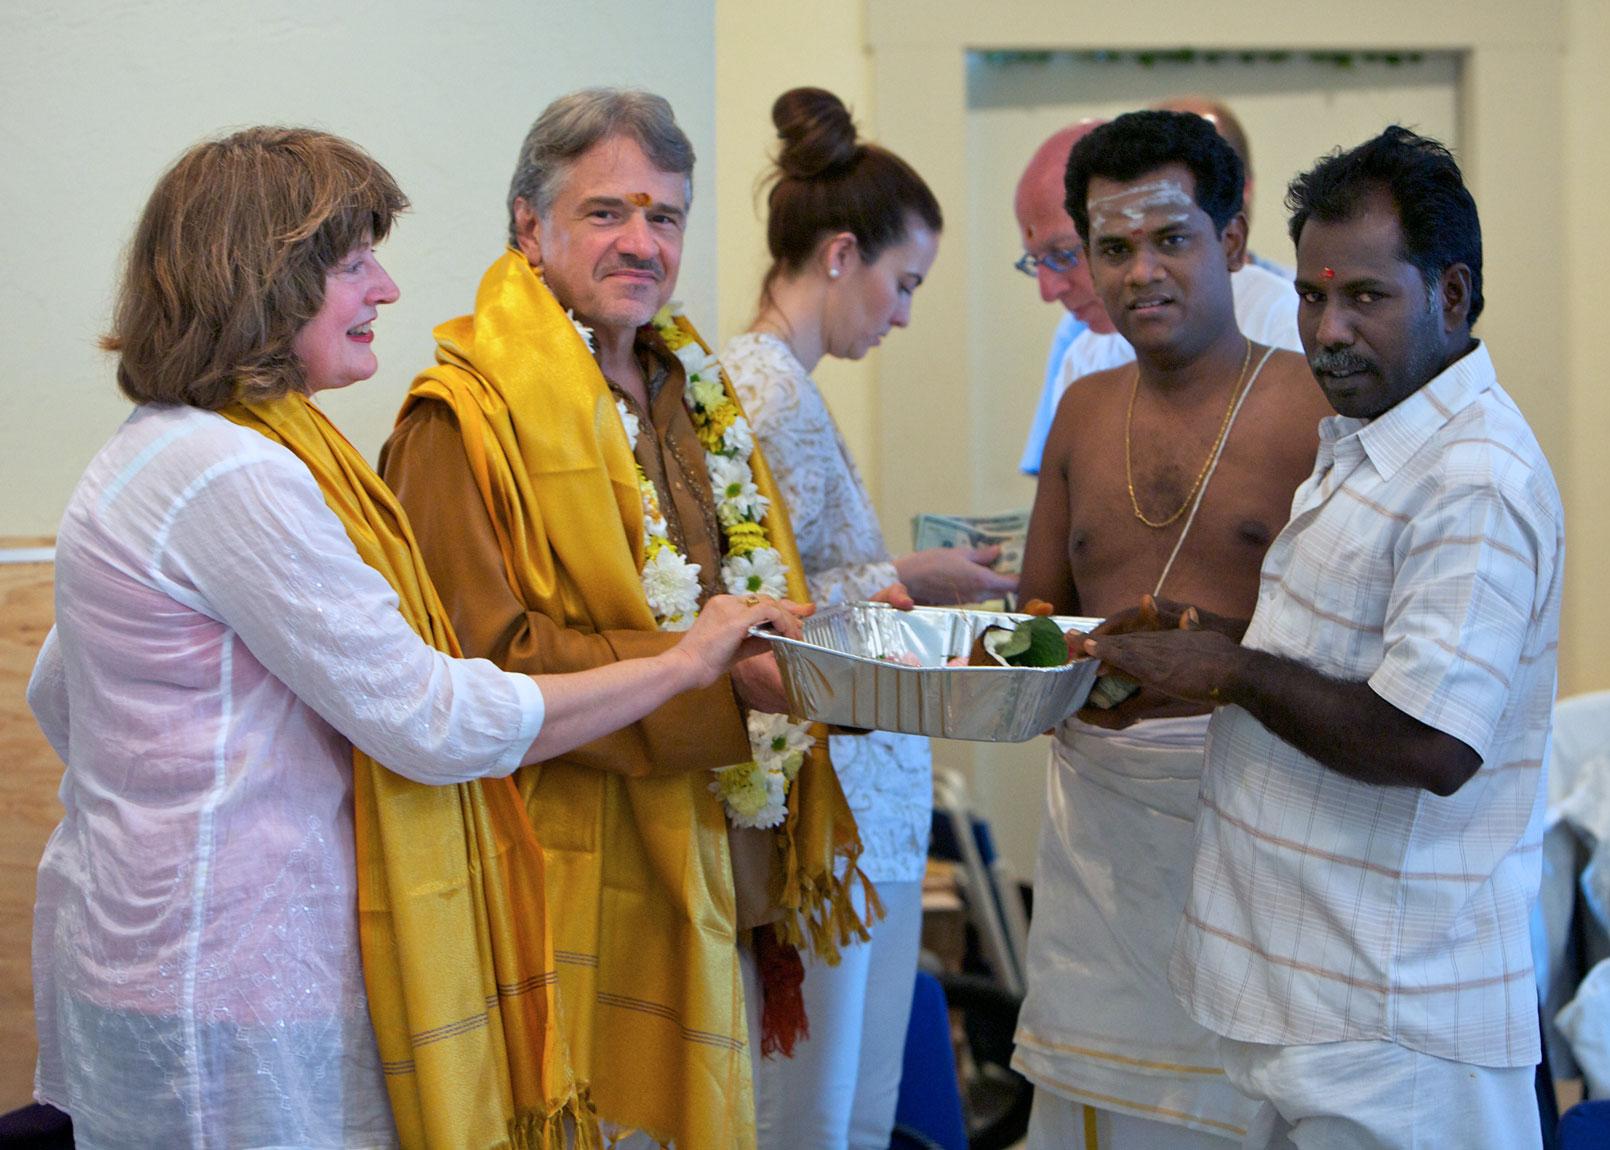 Shilpi Vaithiya Nathan accepts dakshina.